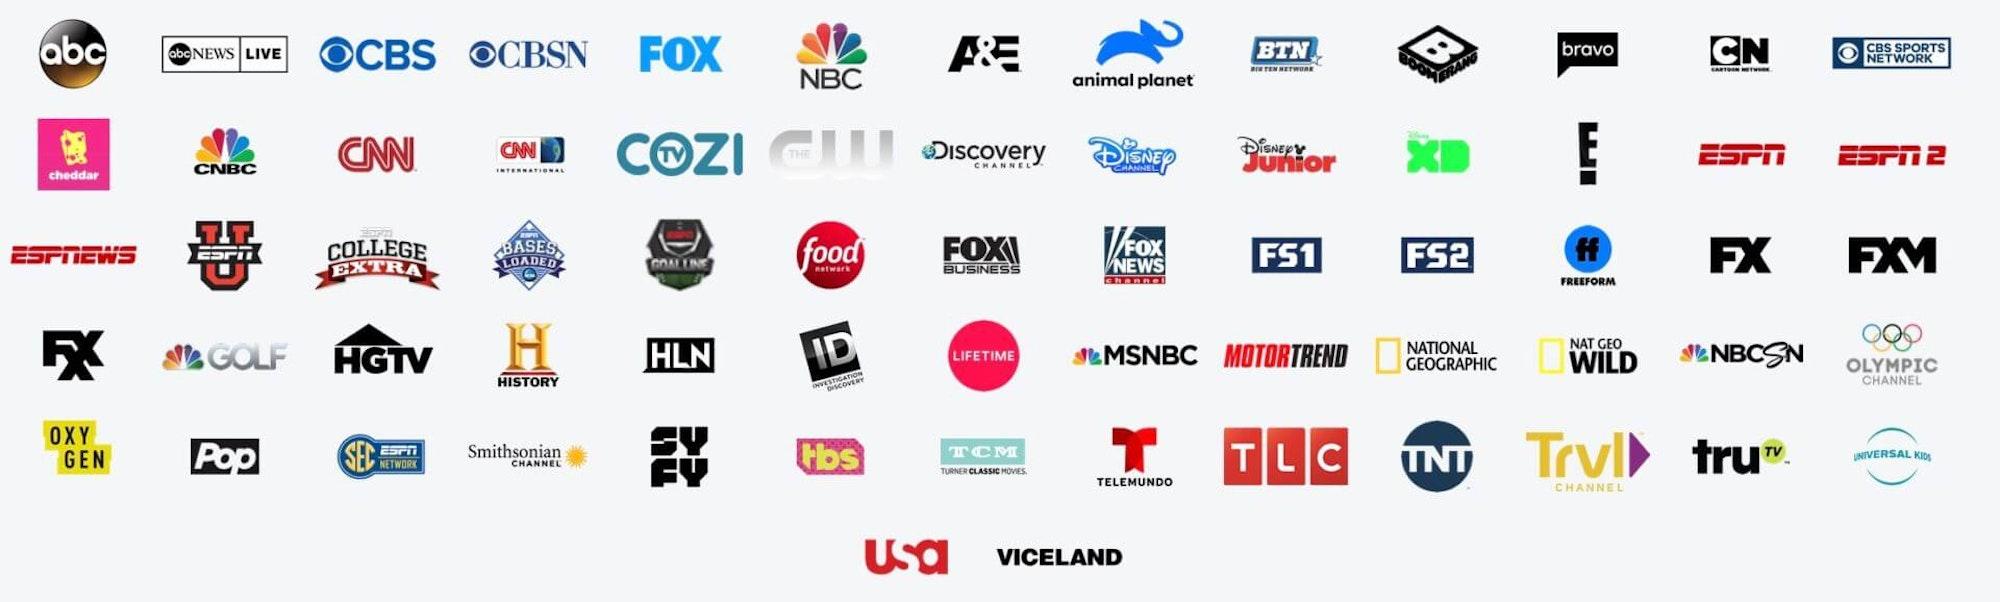 watch jets vs patriots live stream on Hulu with live tv